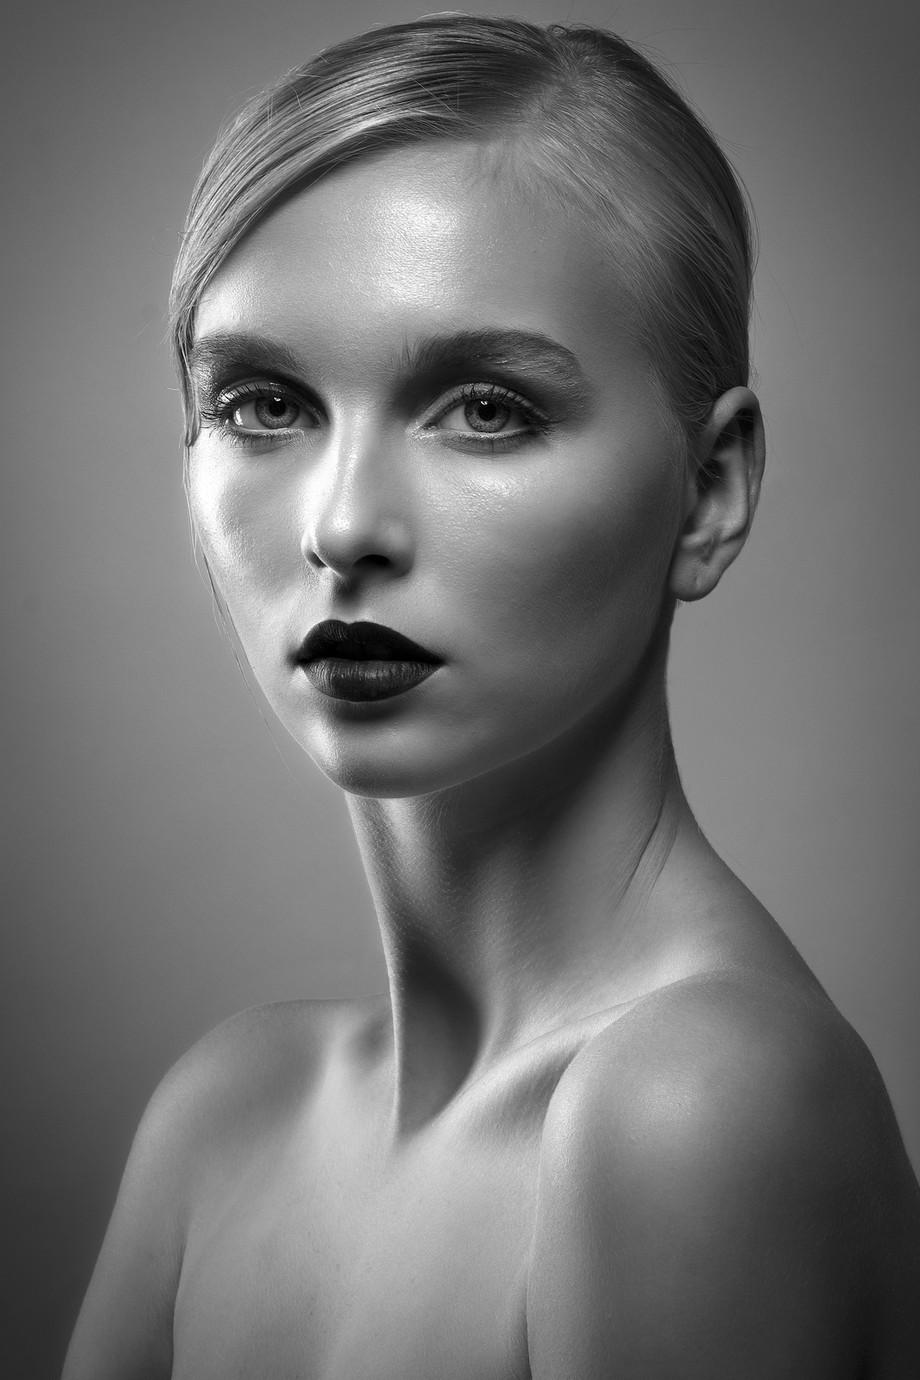 Bea by melamelassa - Black And White Female Portraits Photo Contest